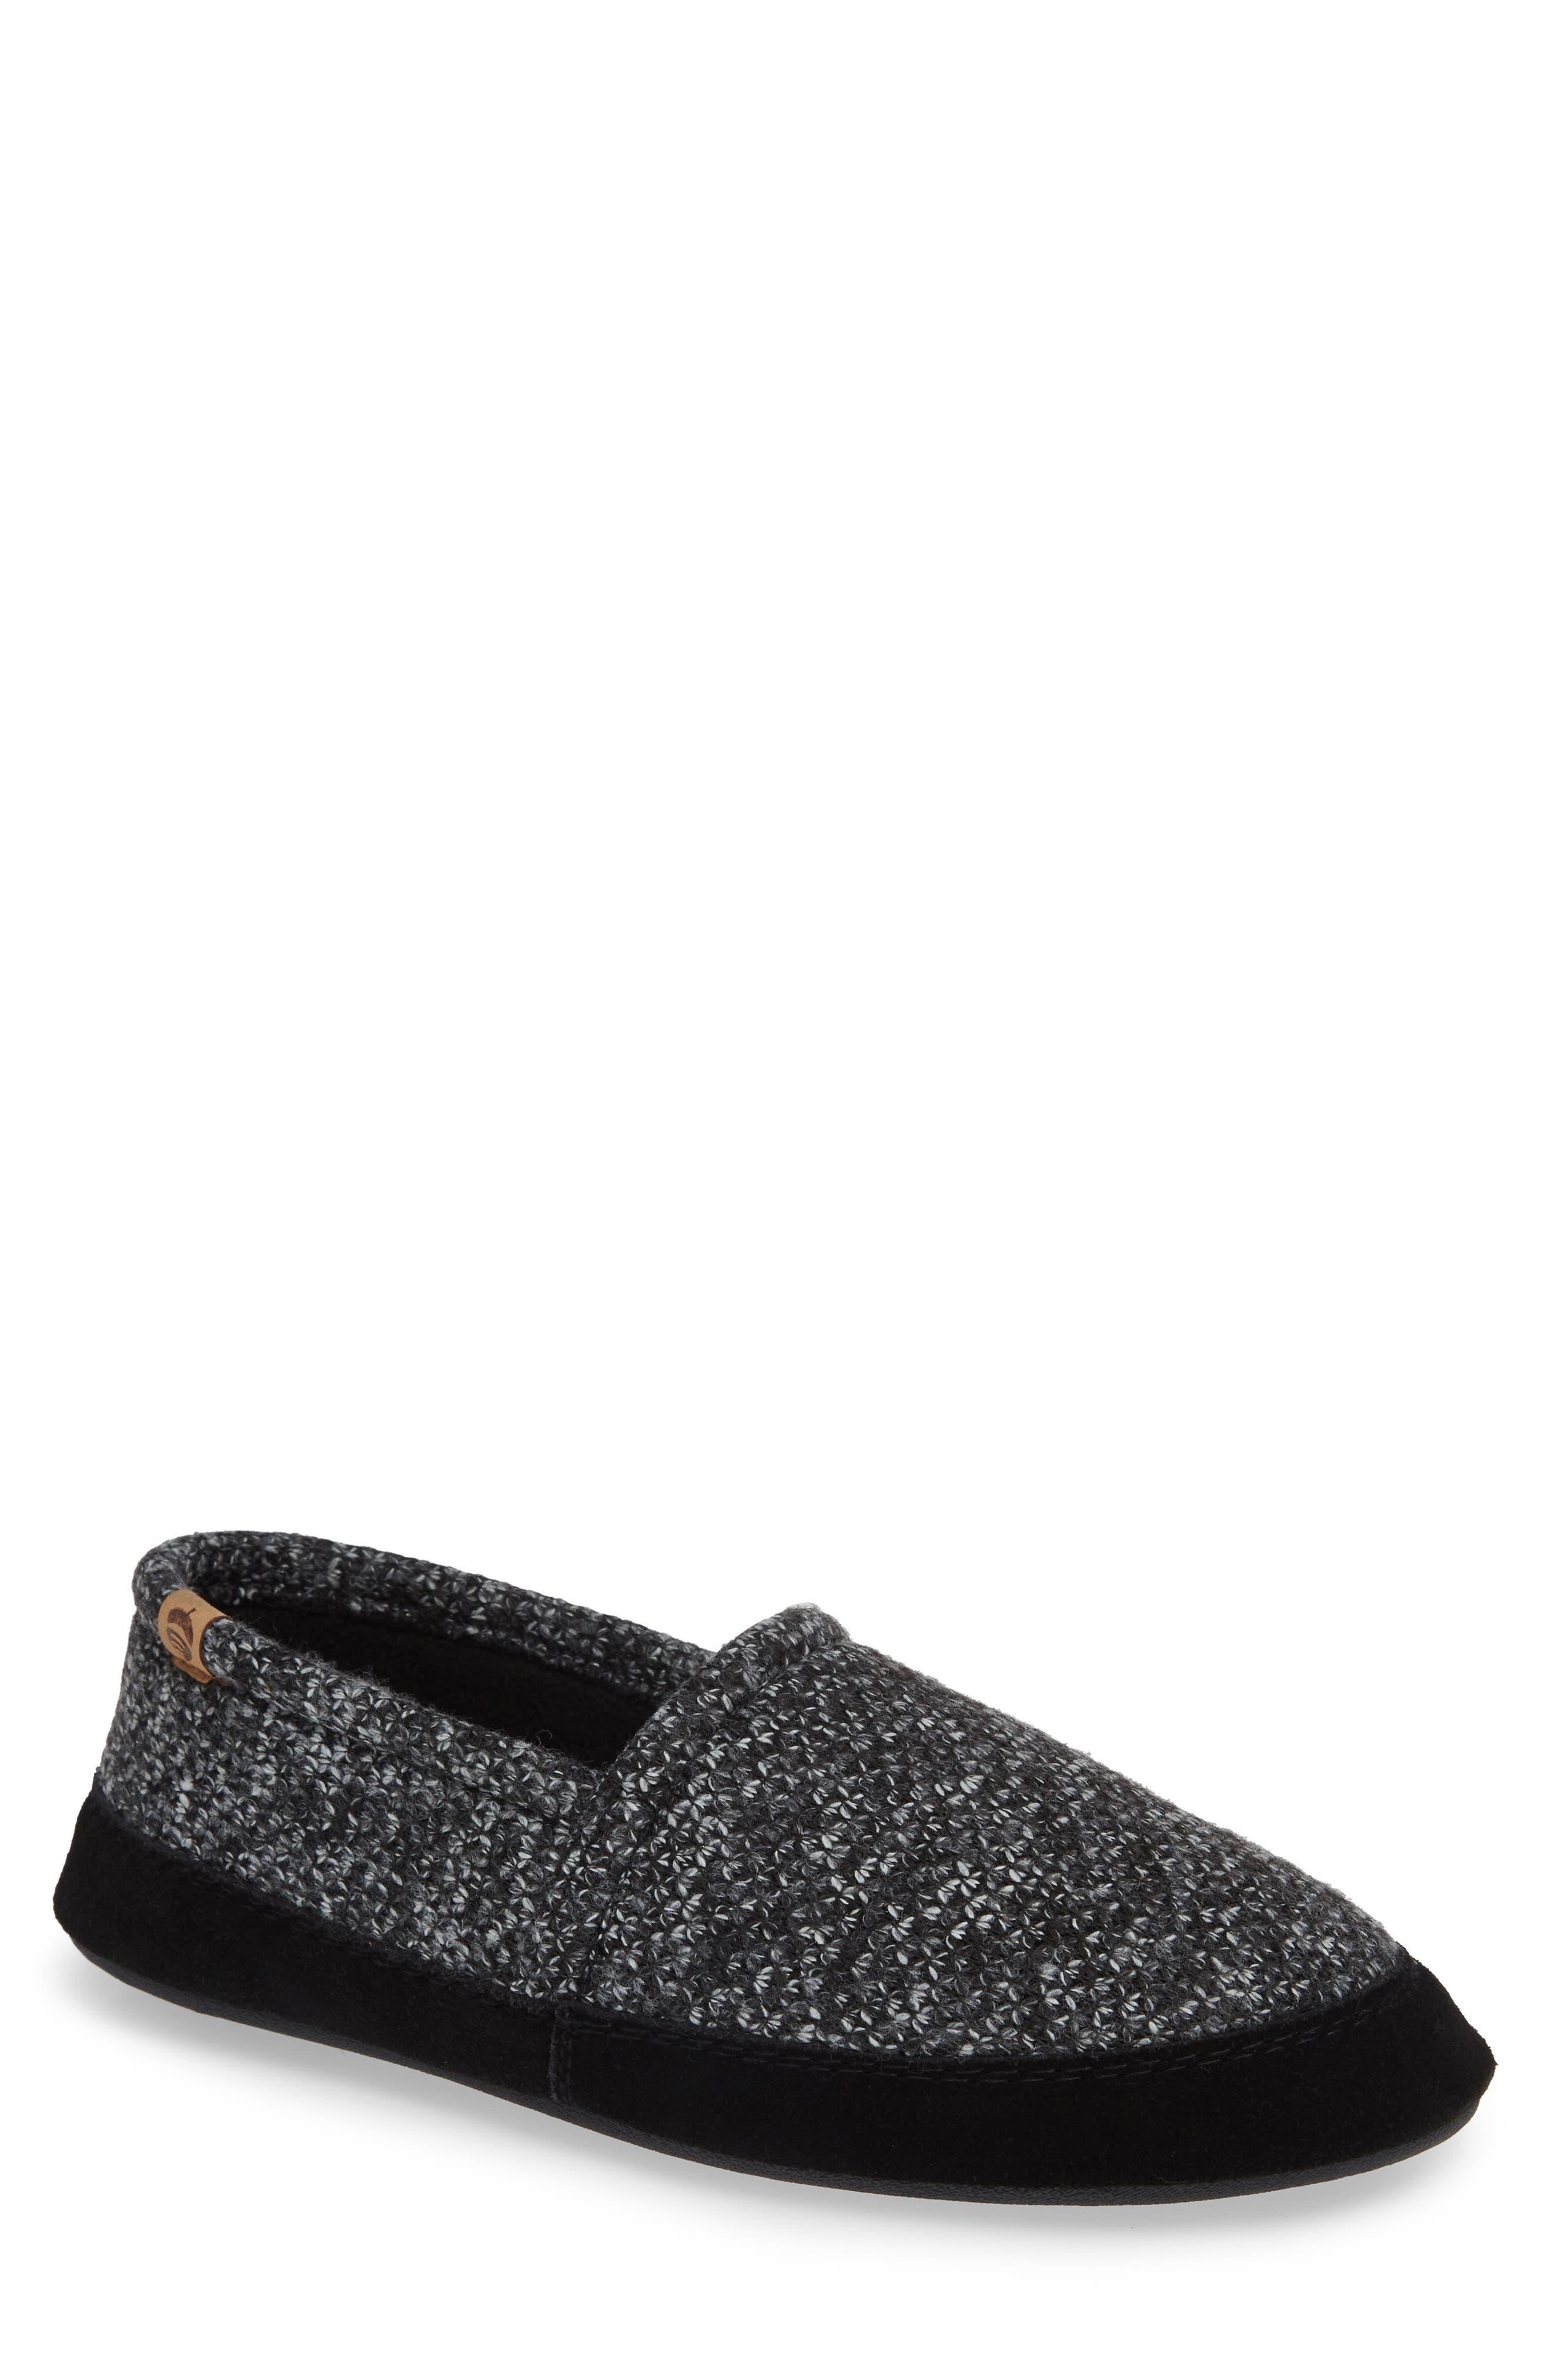 Moc Slipper,                         Main,                         color, BLACK TWEED